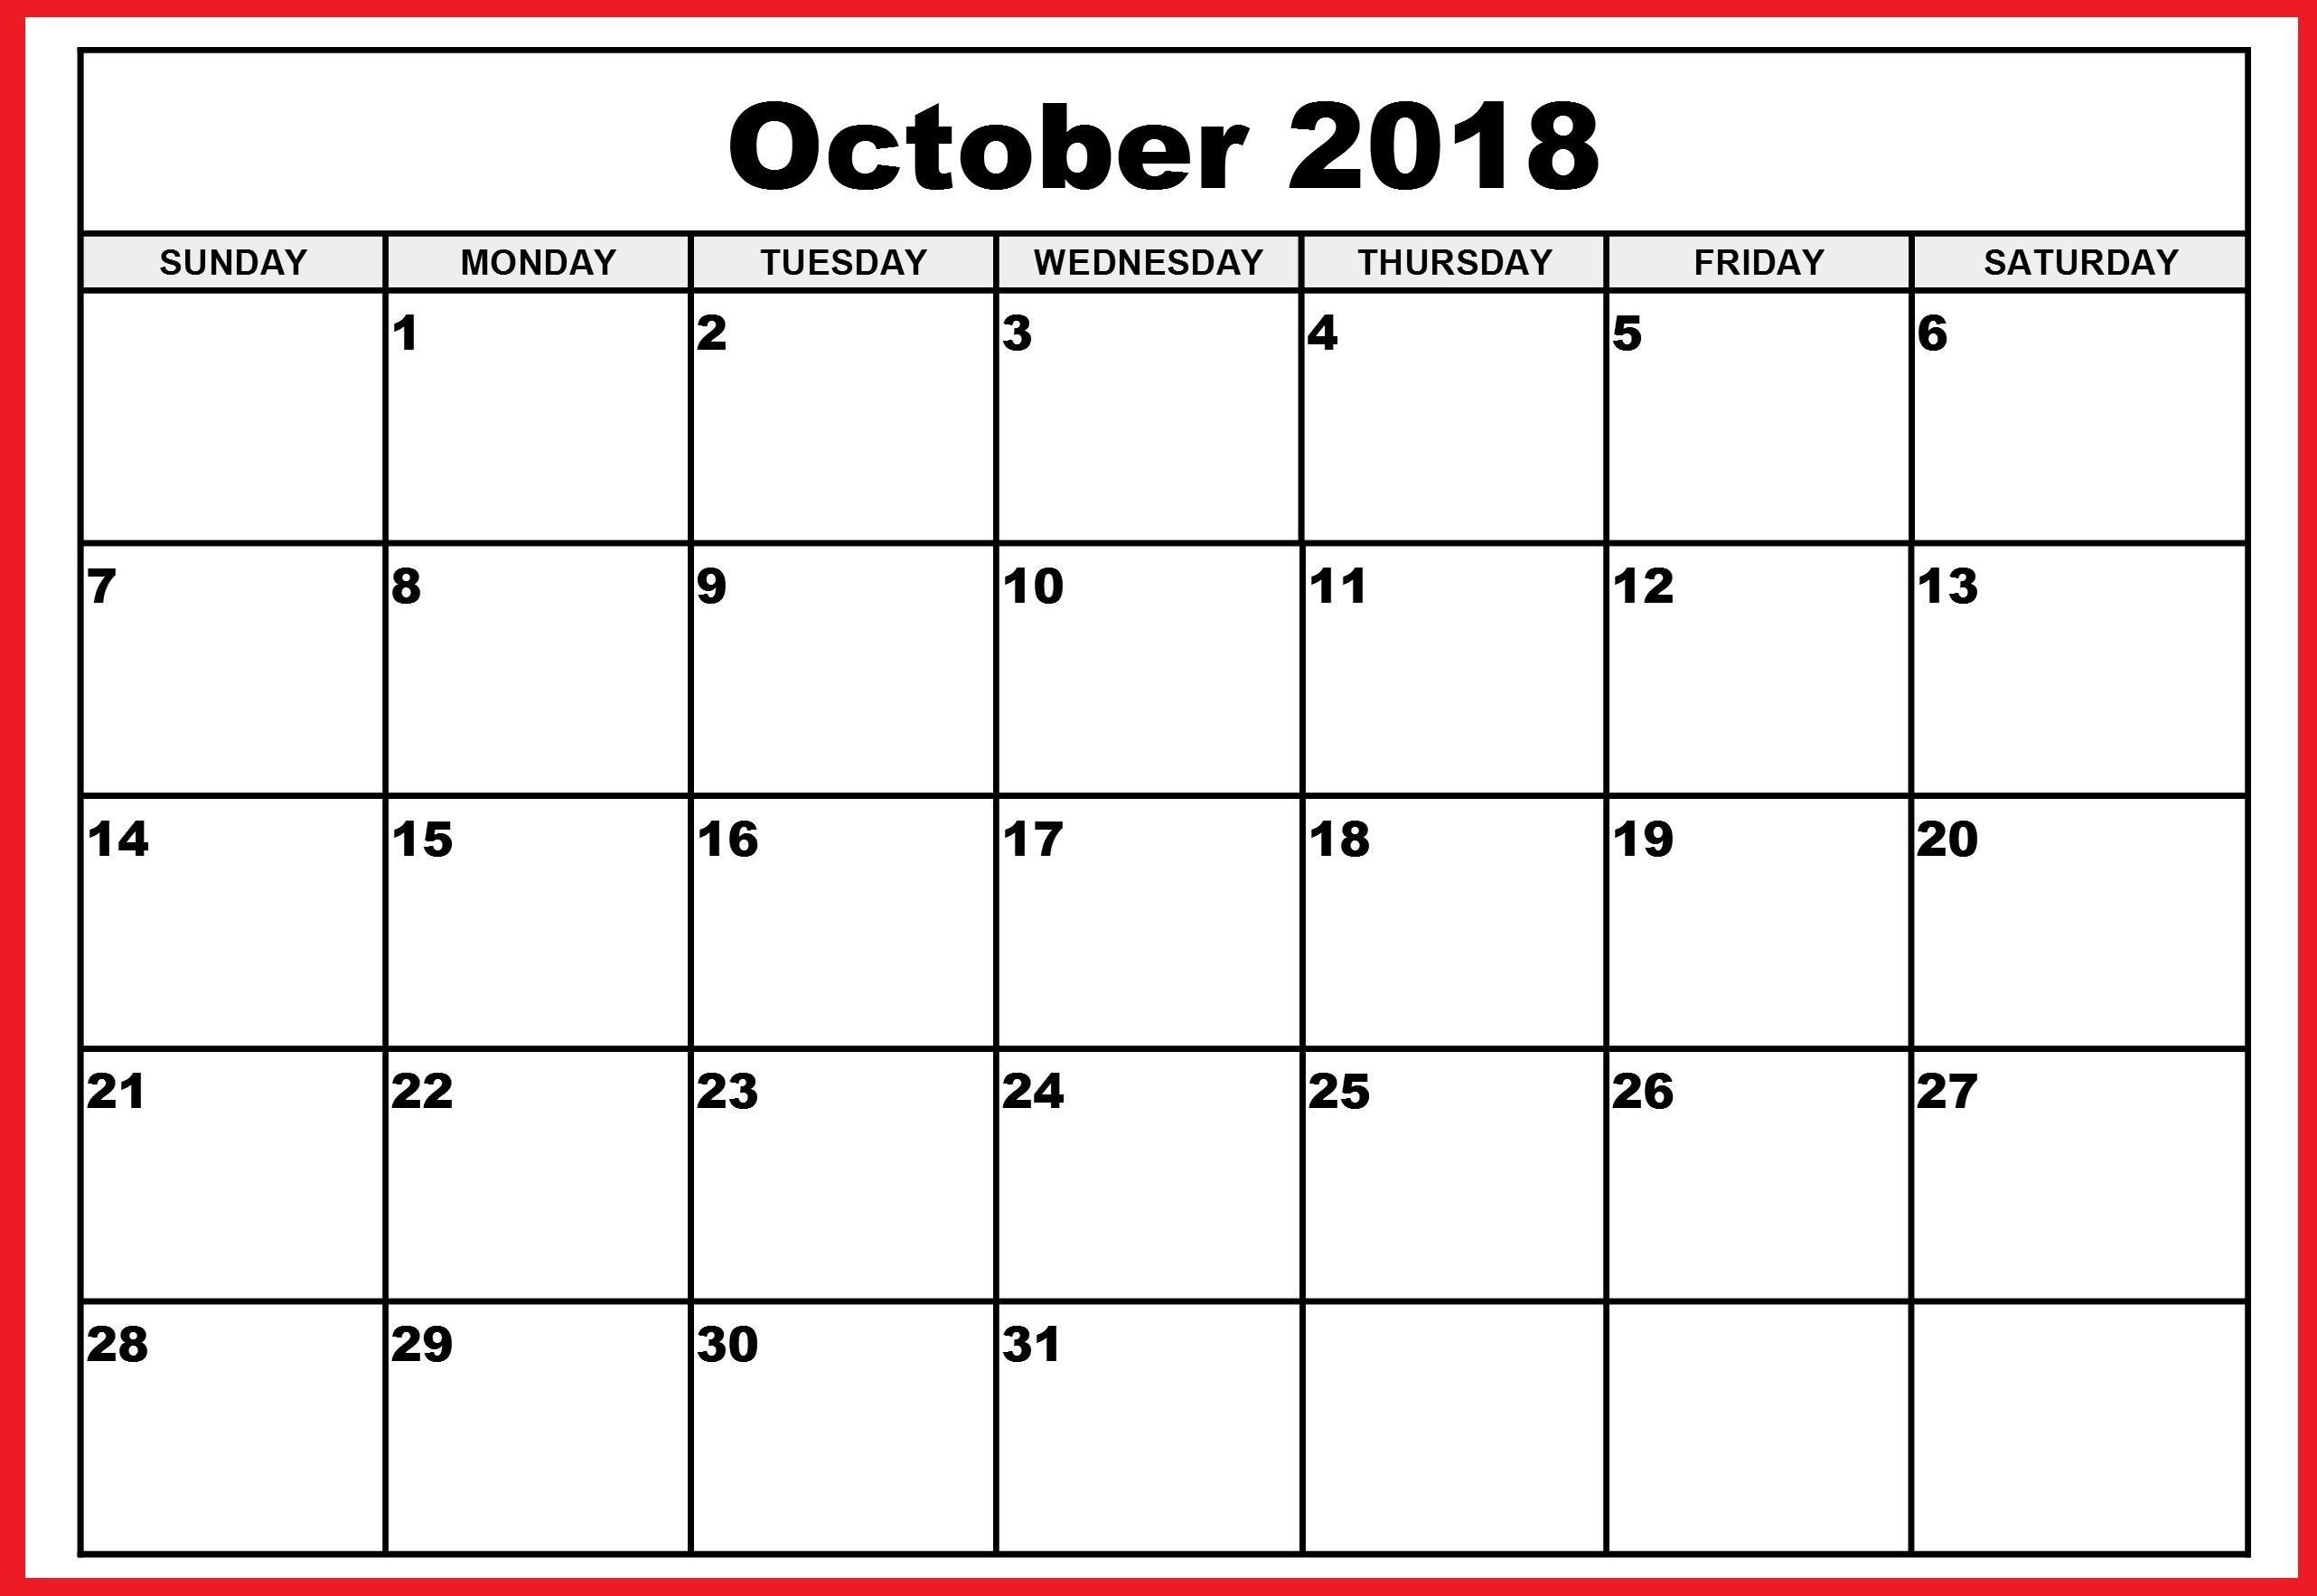 October 2018 Landscape Calendar